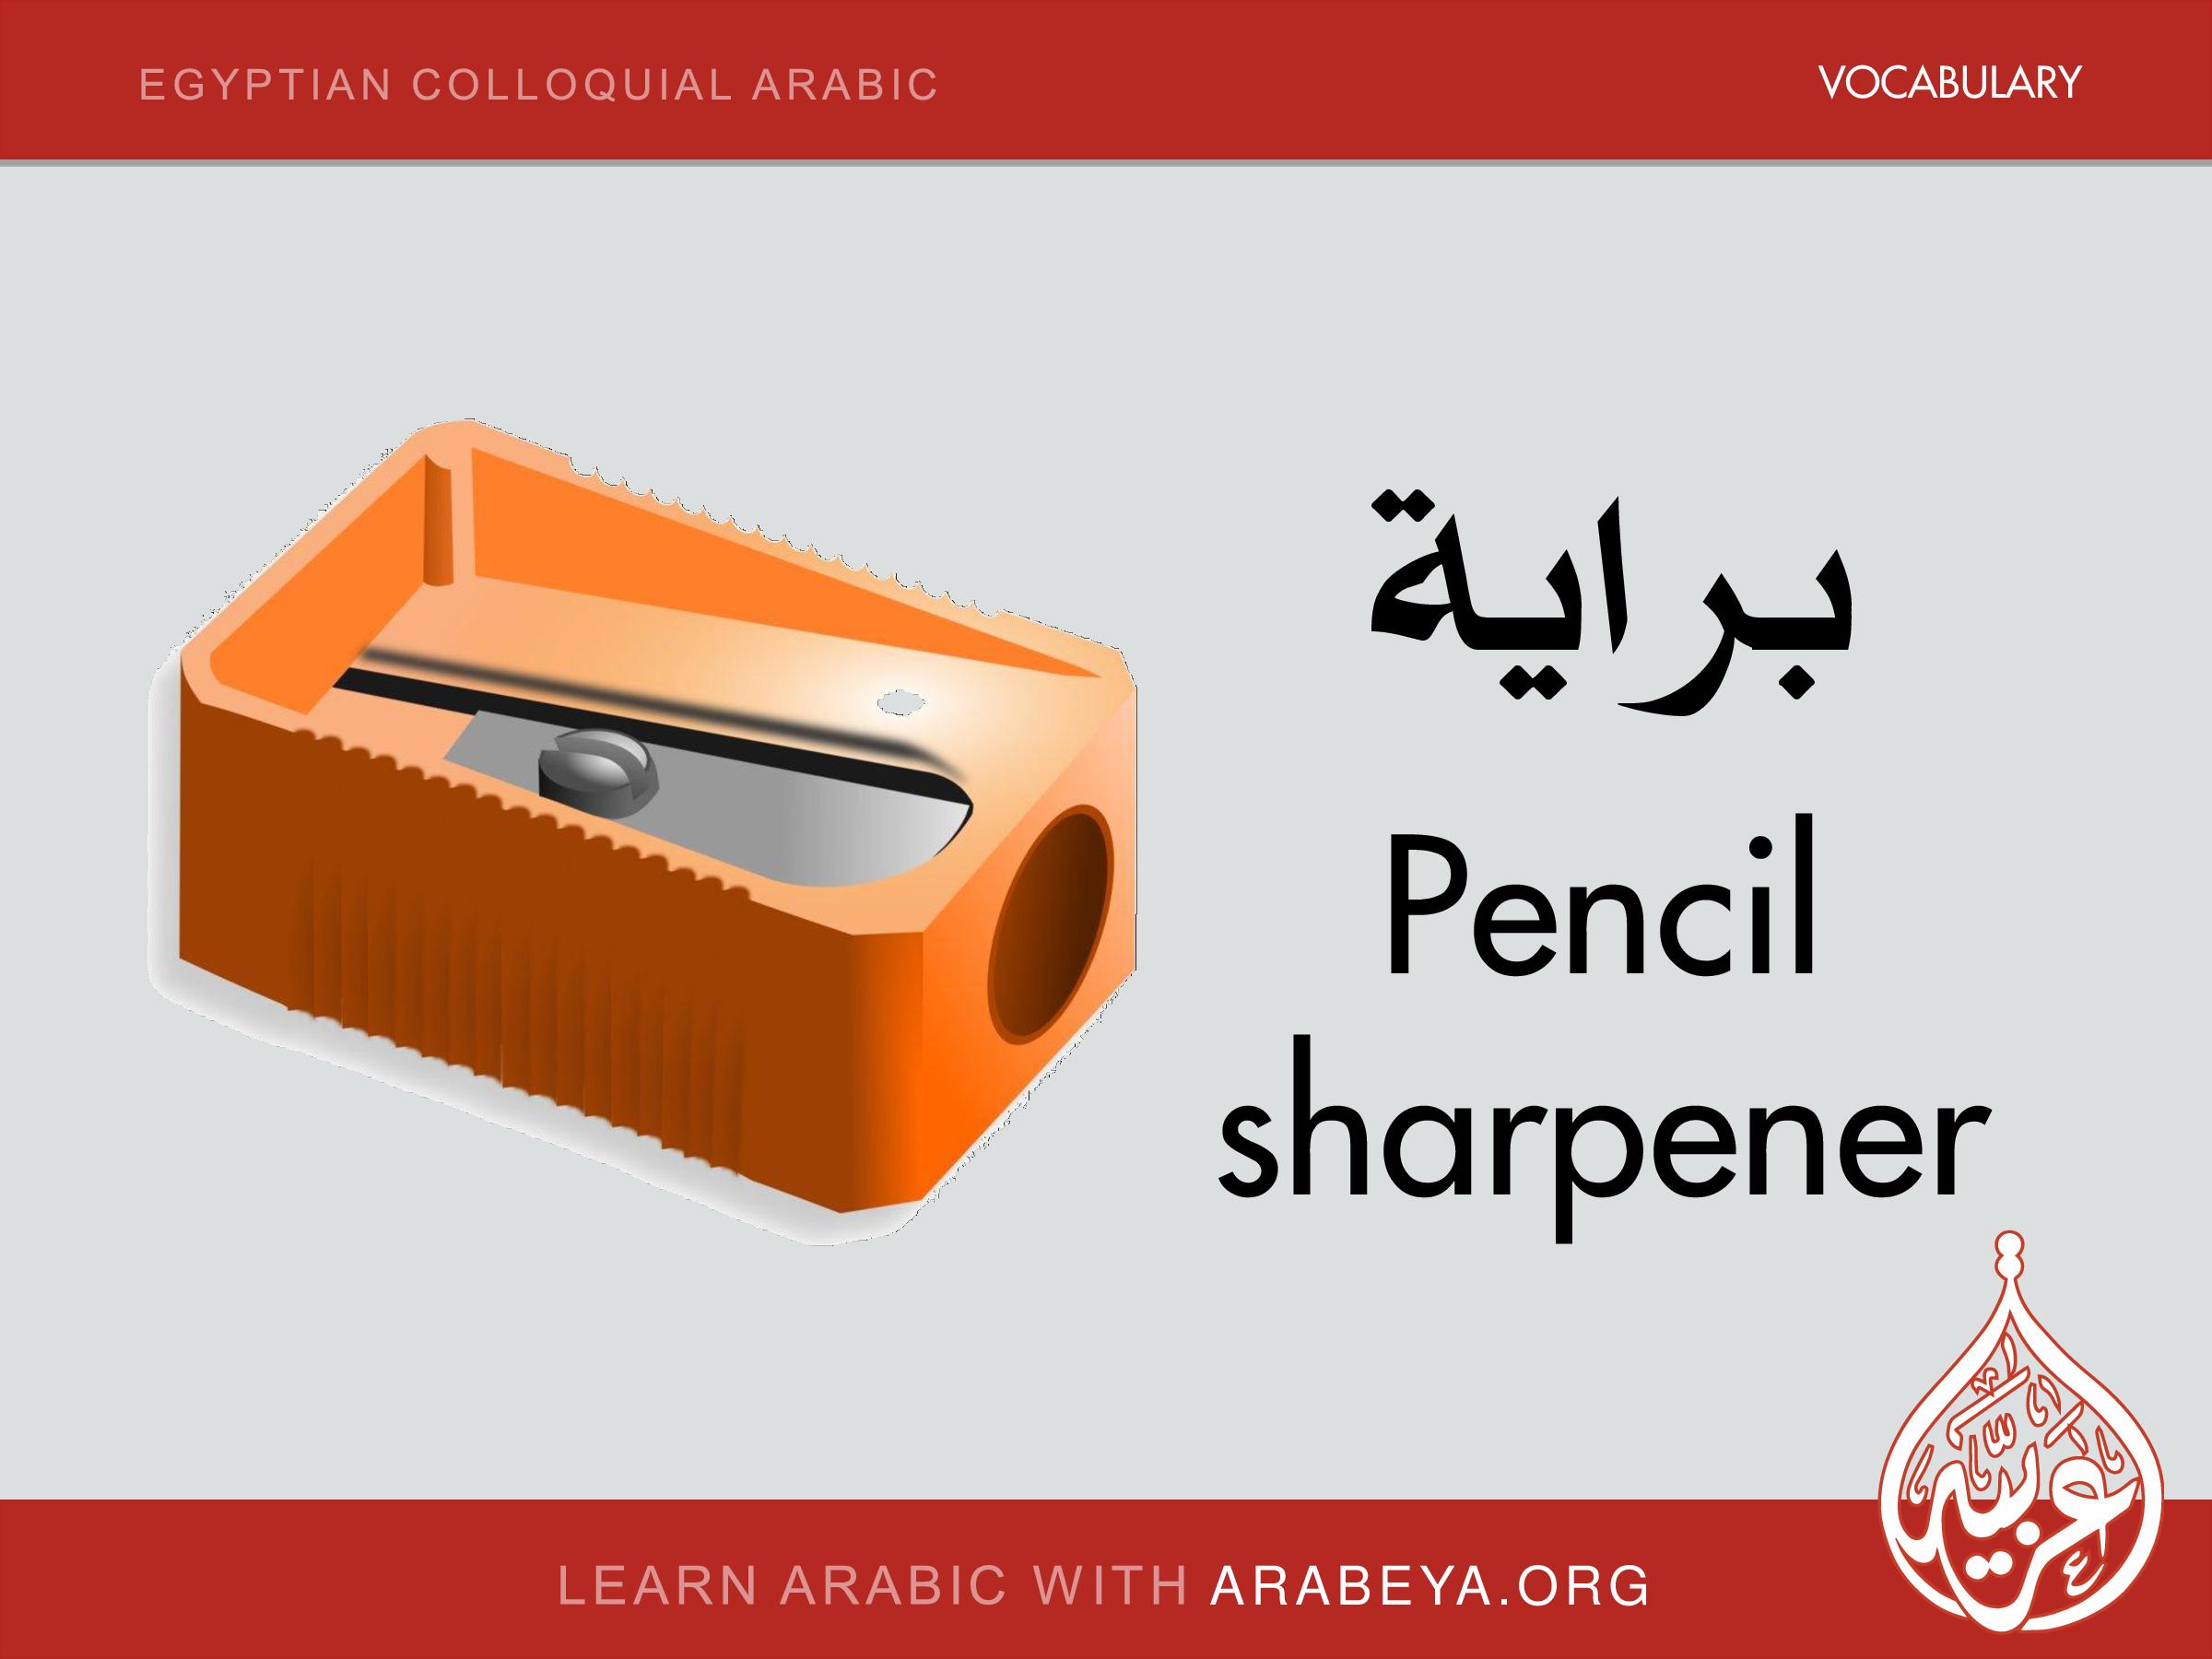 Pencil Sharpener Learn English Words English Language Learning Learning Arabic